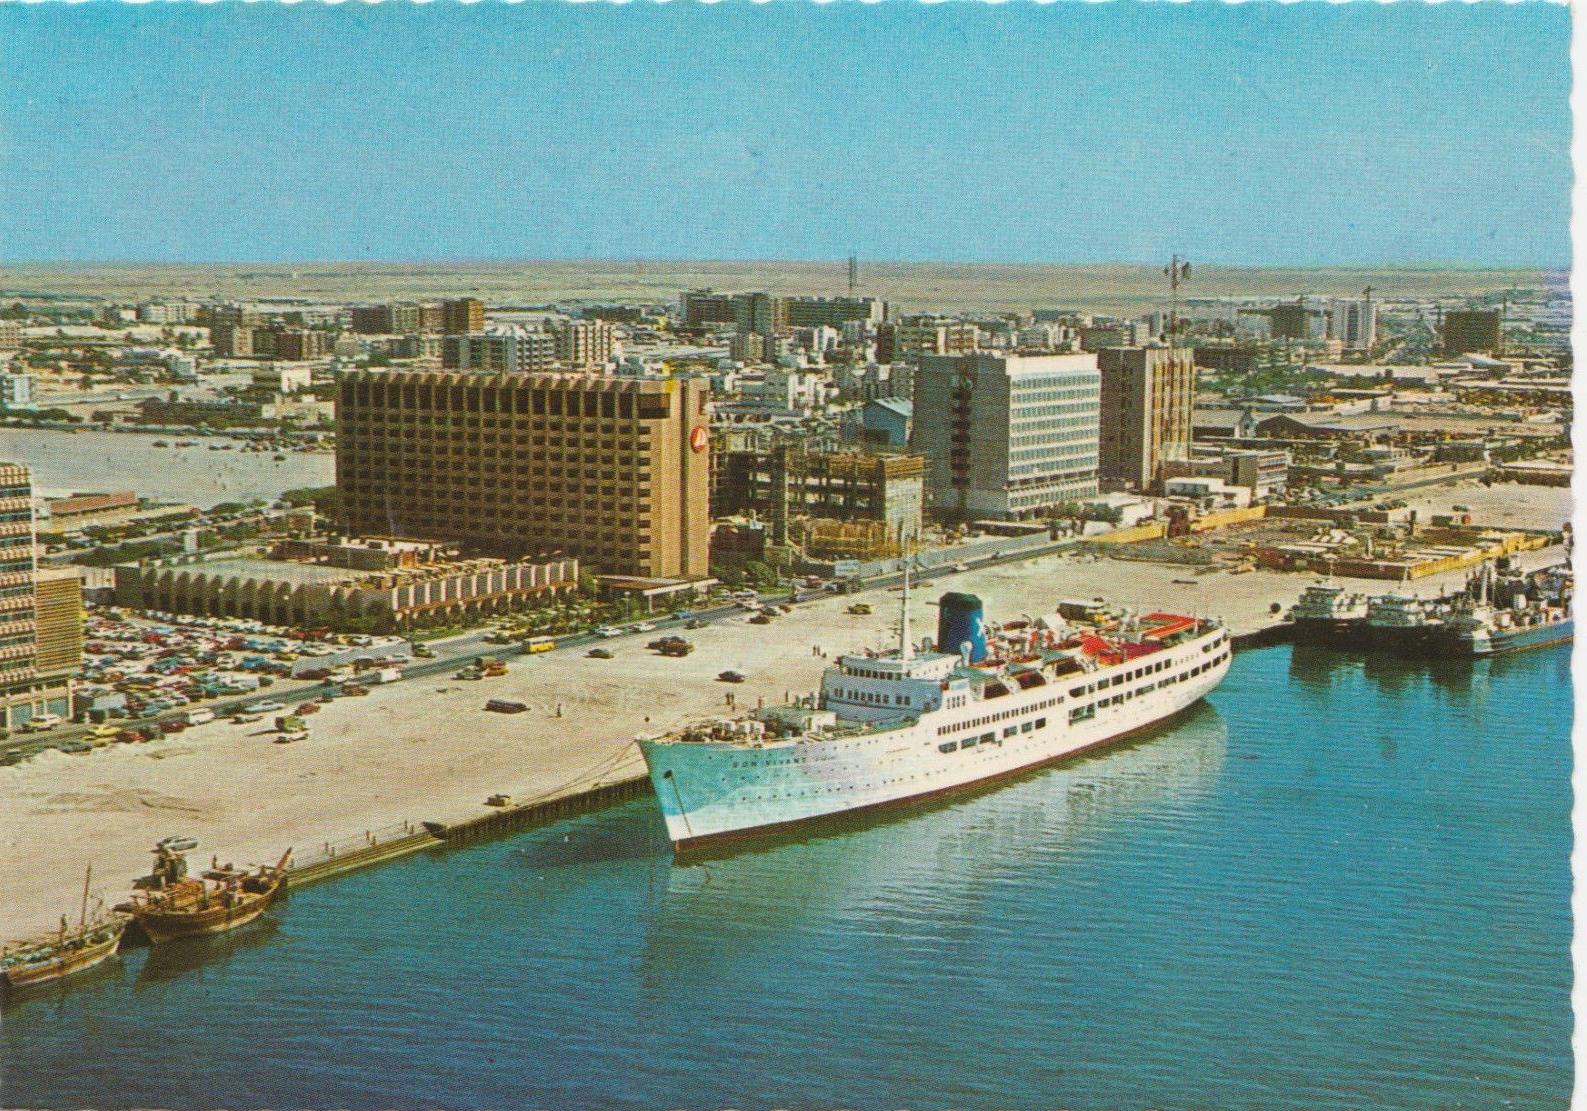 Dubai cruise.jpg